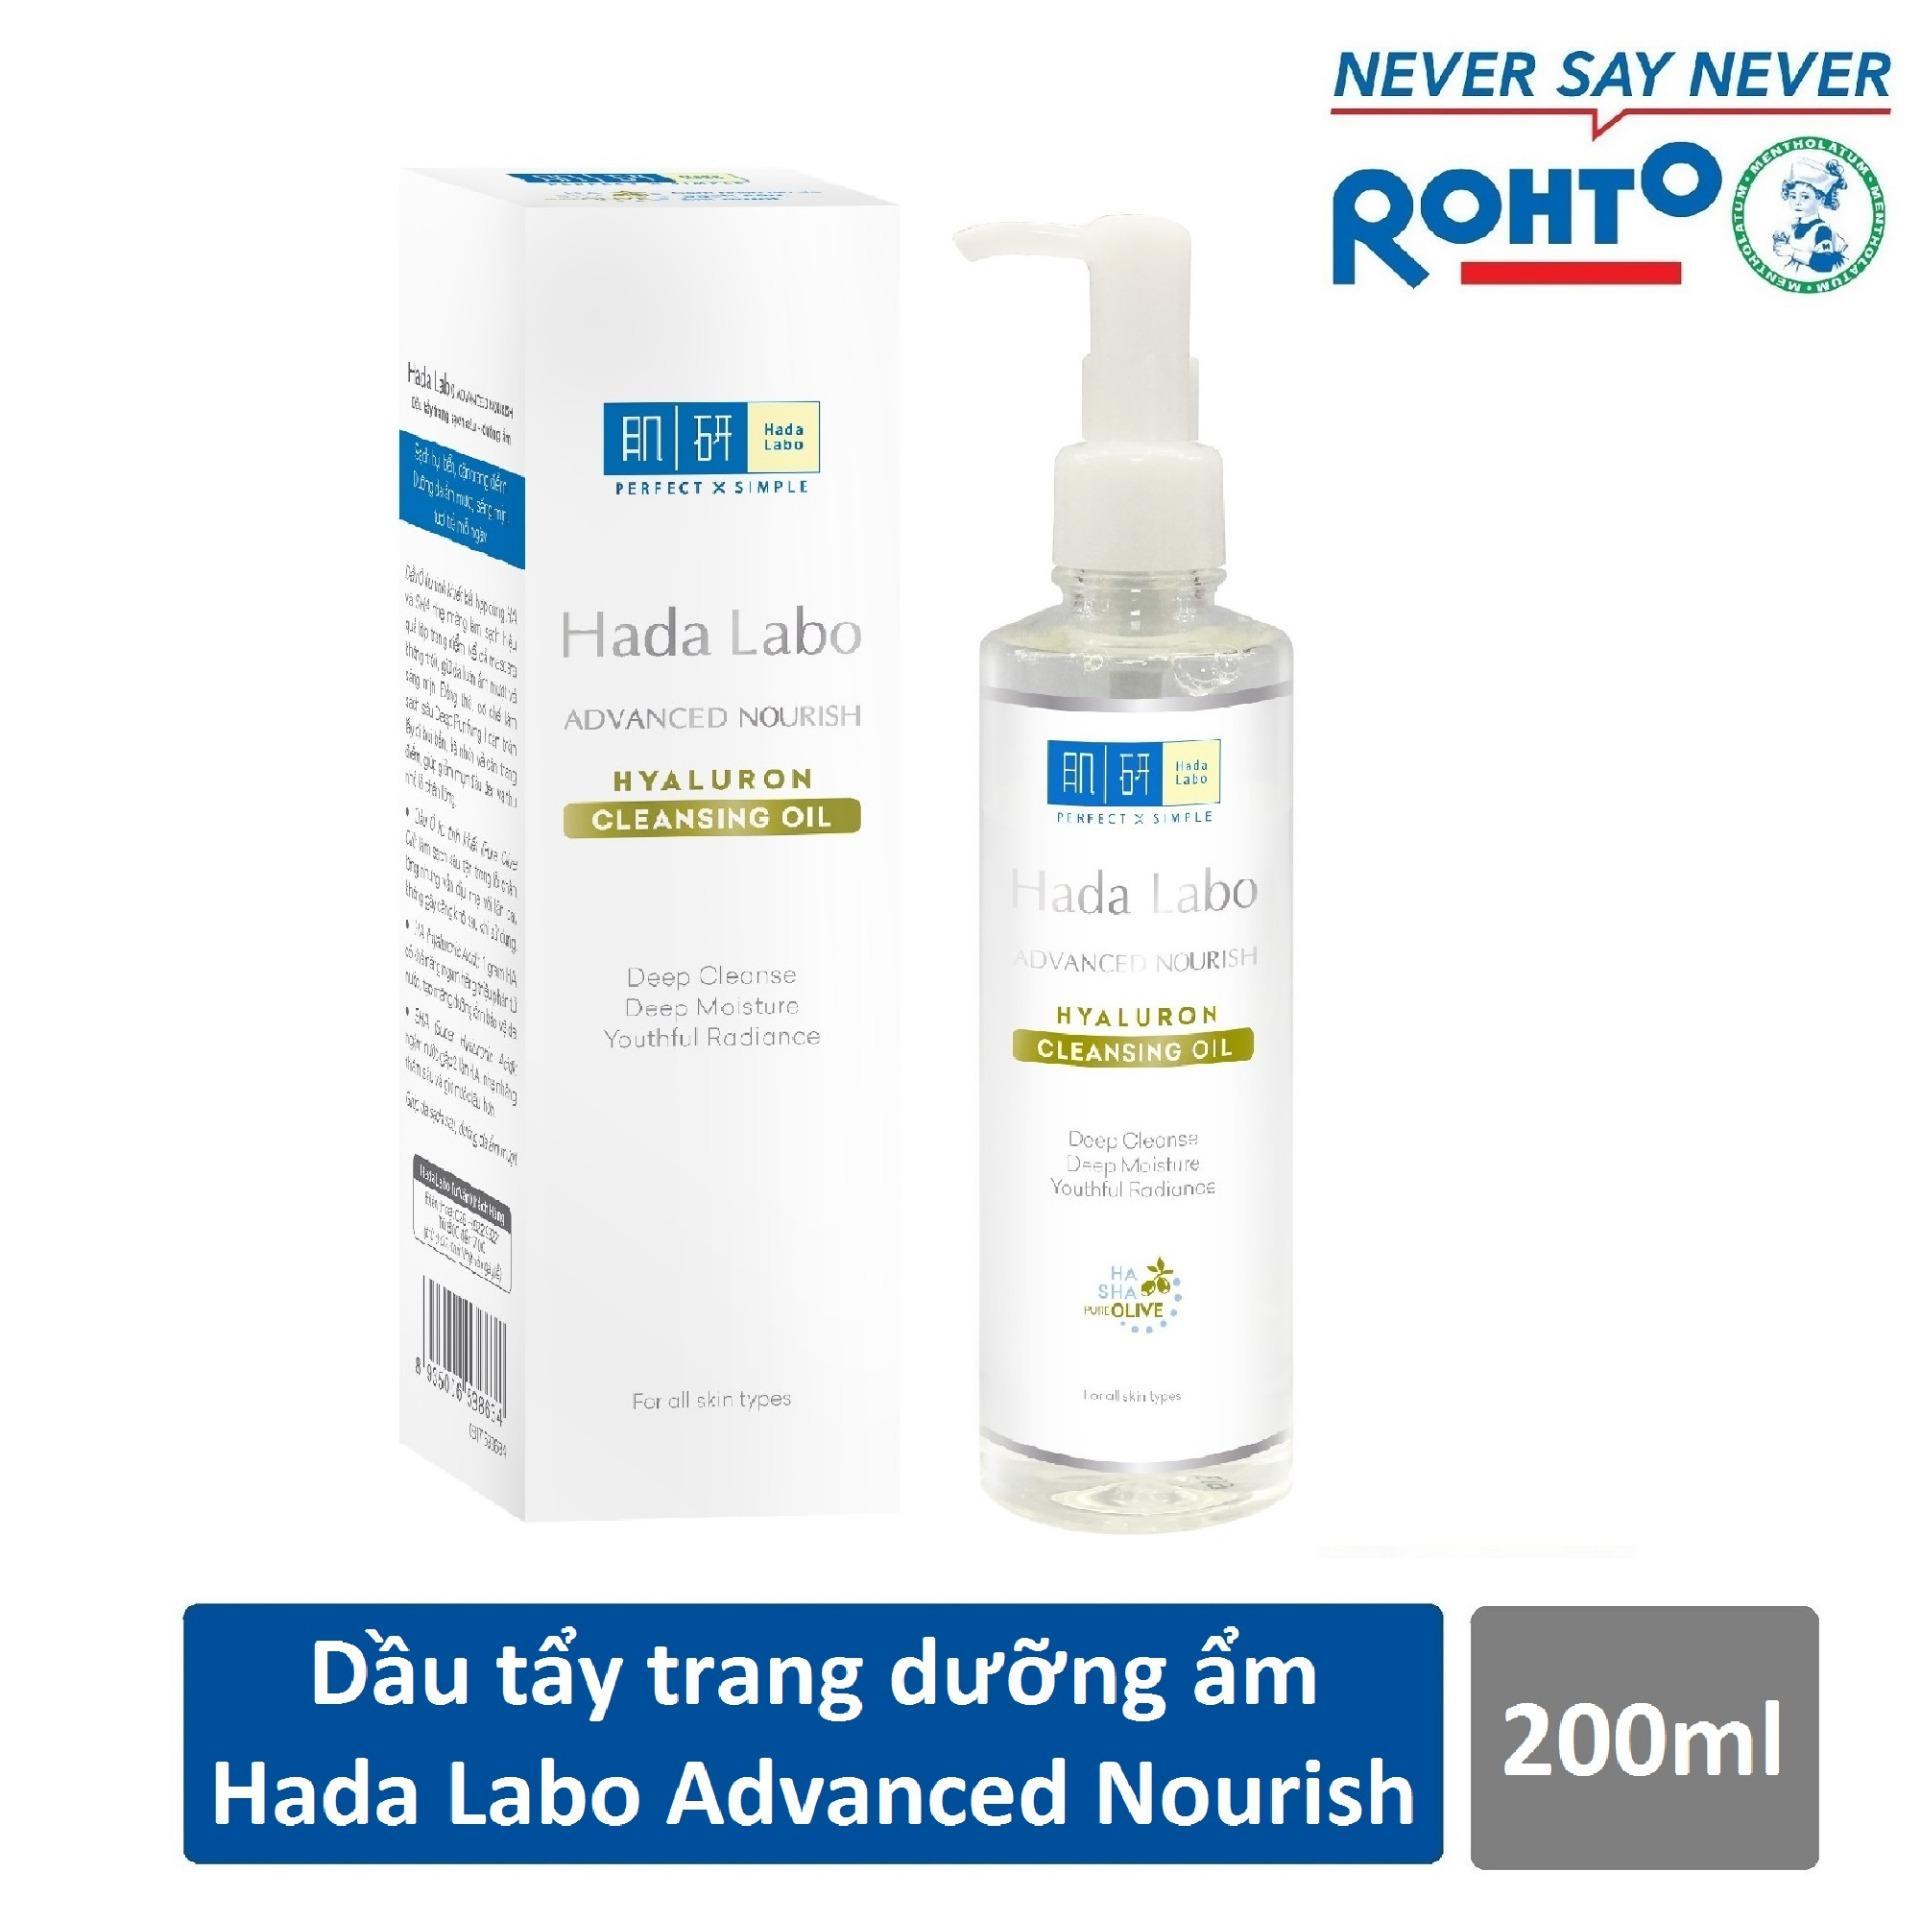 Dầu tẩy trang Hada Labo Advanced Nourish Hyaluron Cleansing Oil 200ml